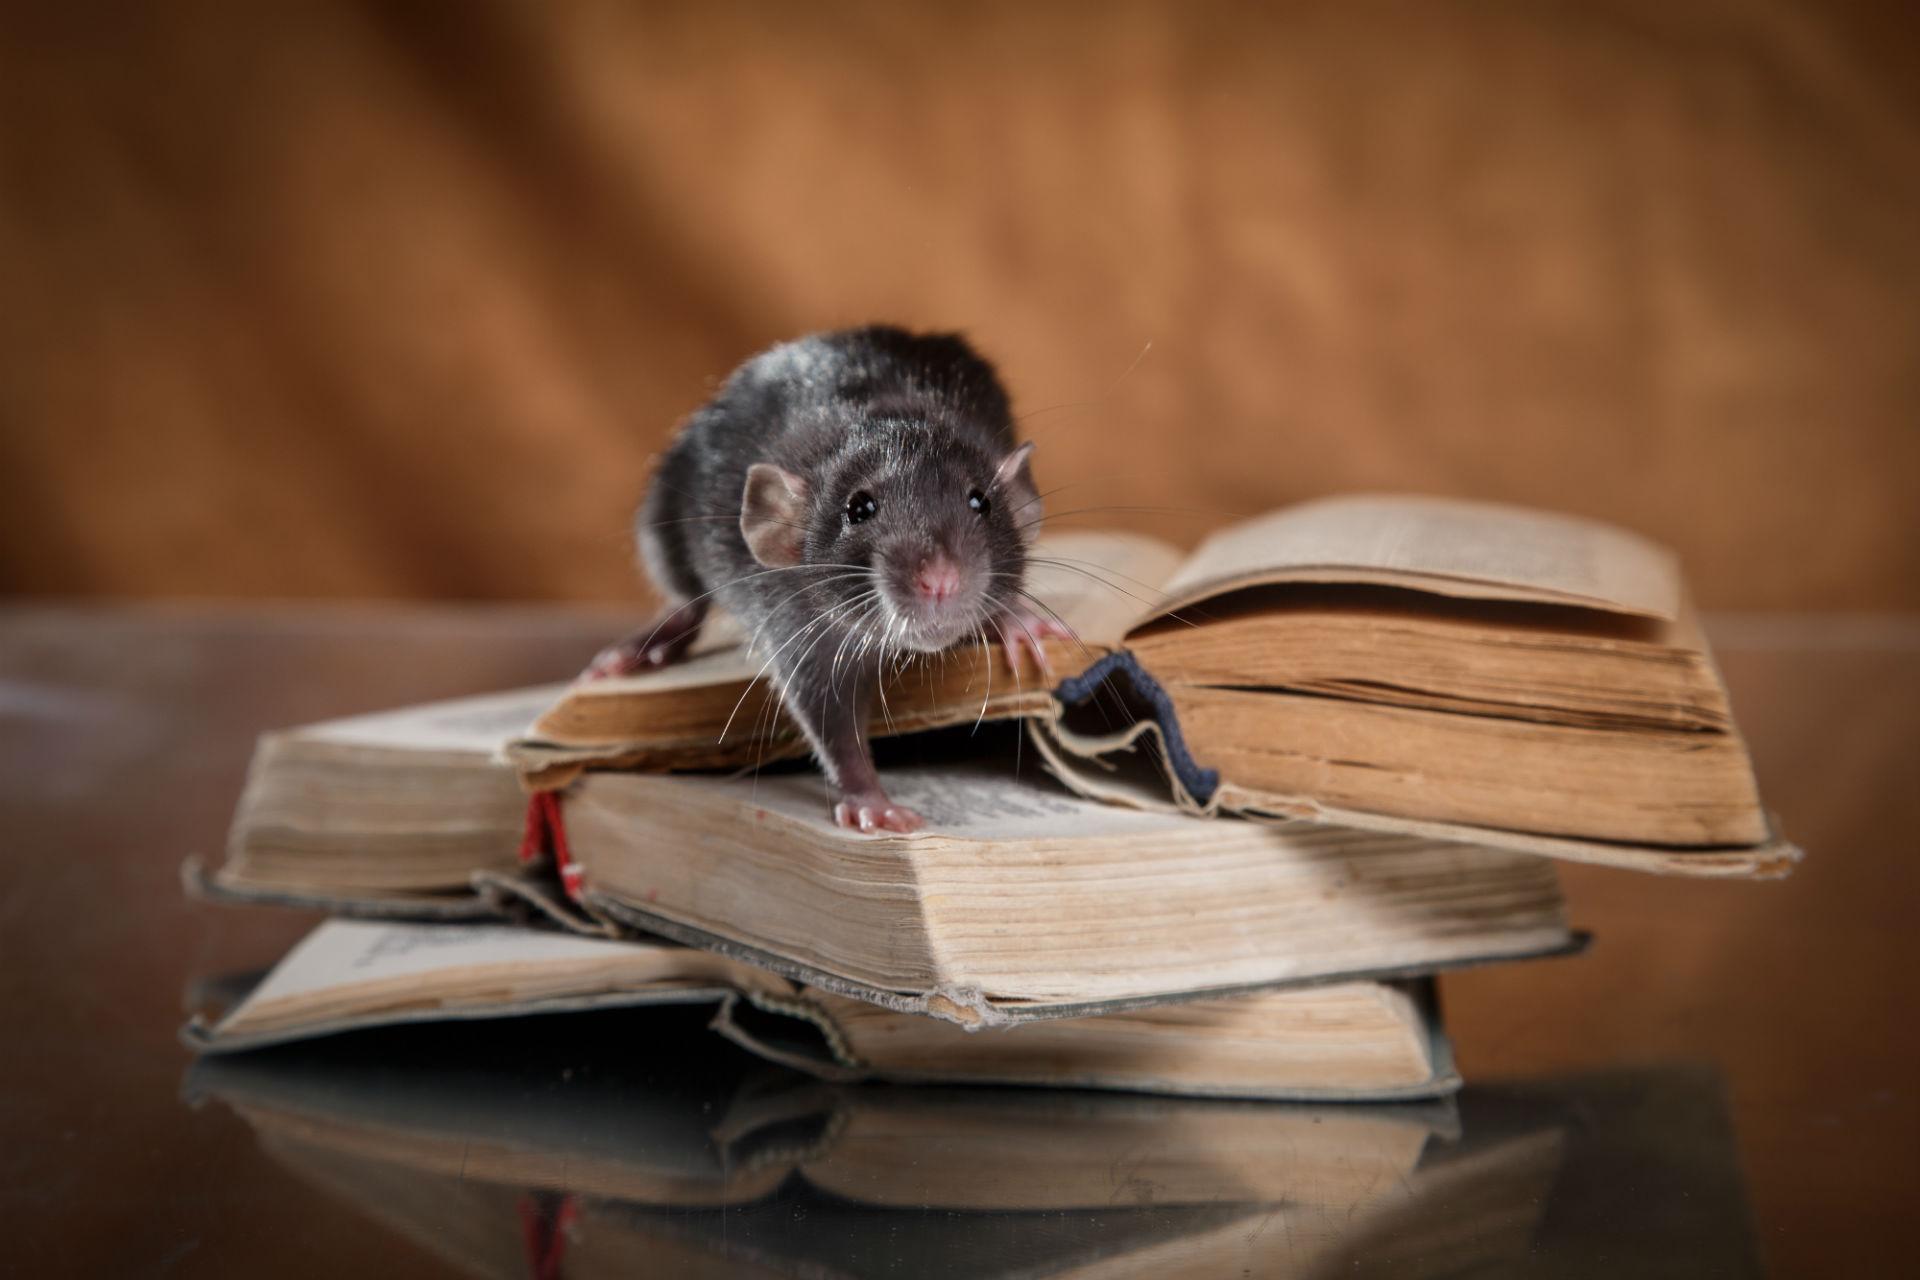 Extermination Rats | Extermination mice Montreal | Lex-Terminateurjm